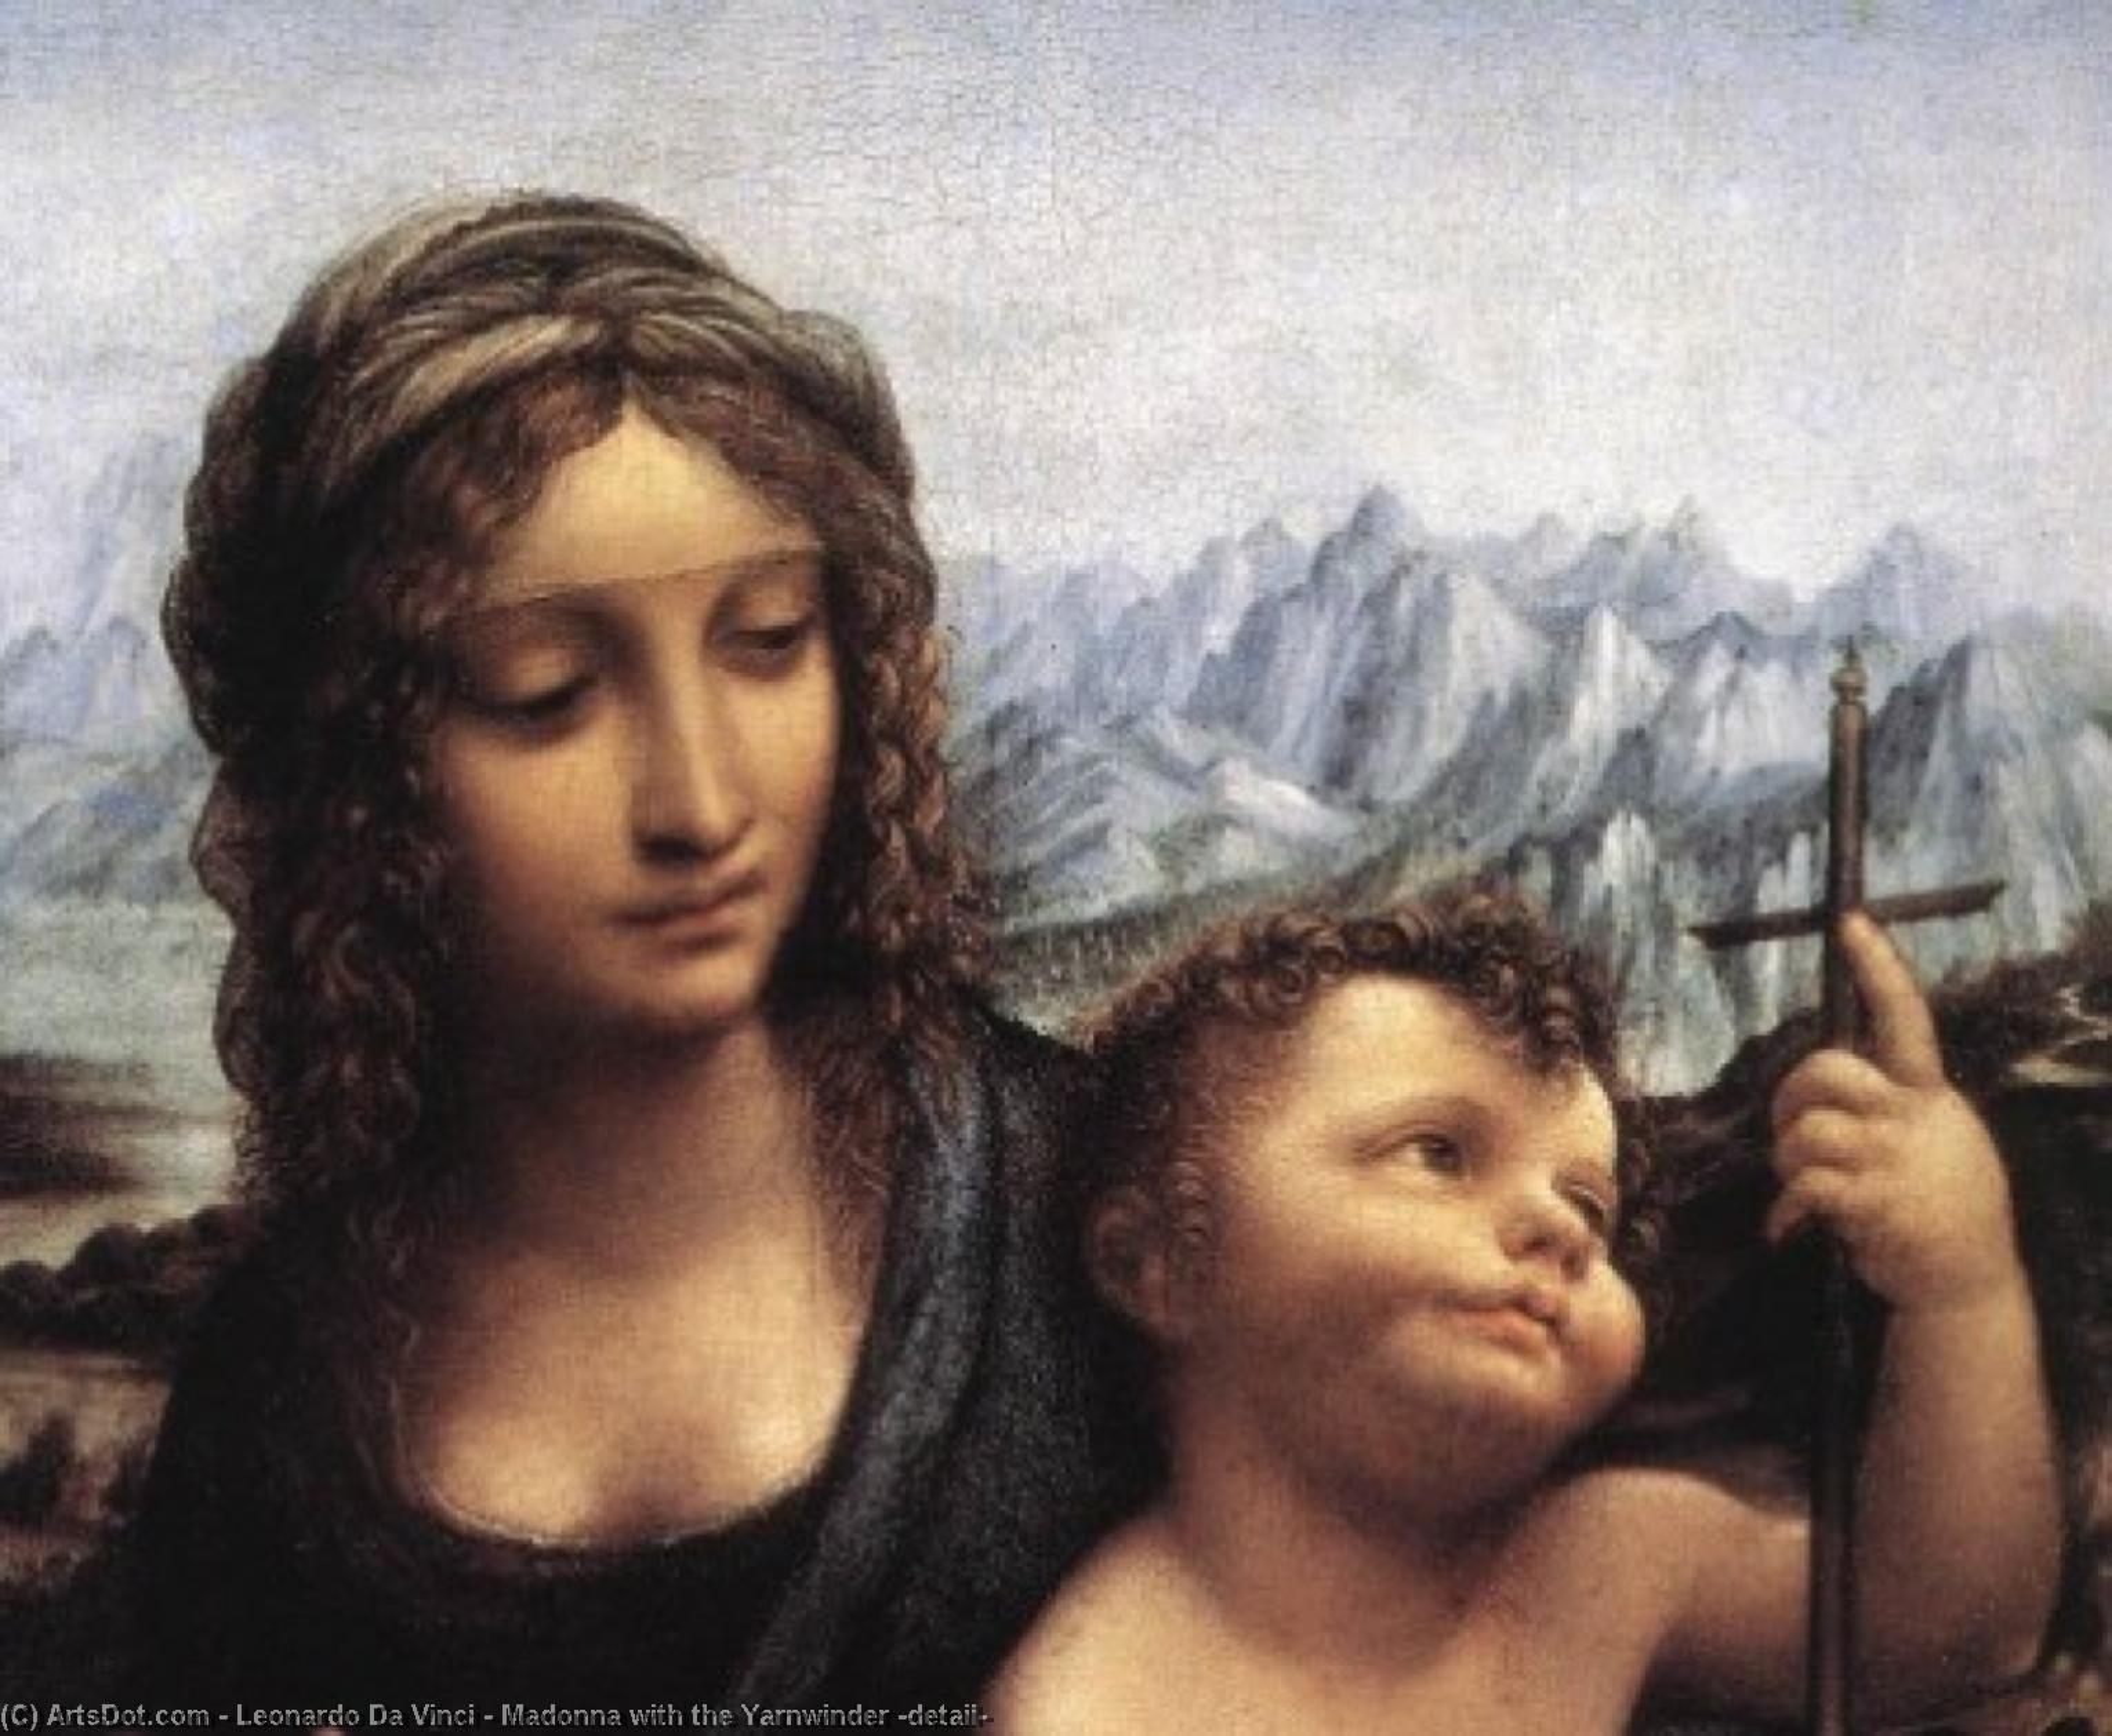 WikiOO.org - Güzel Sanatlar Ansiklopedisi - Resim, Resimler Leonardo Da Vinci - Madonna with the Yarnwinder (detail)